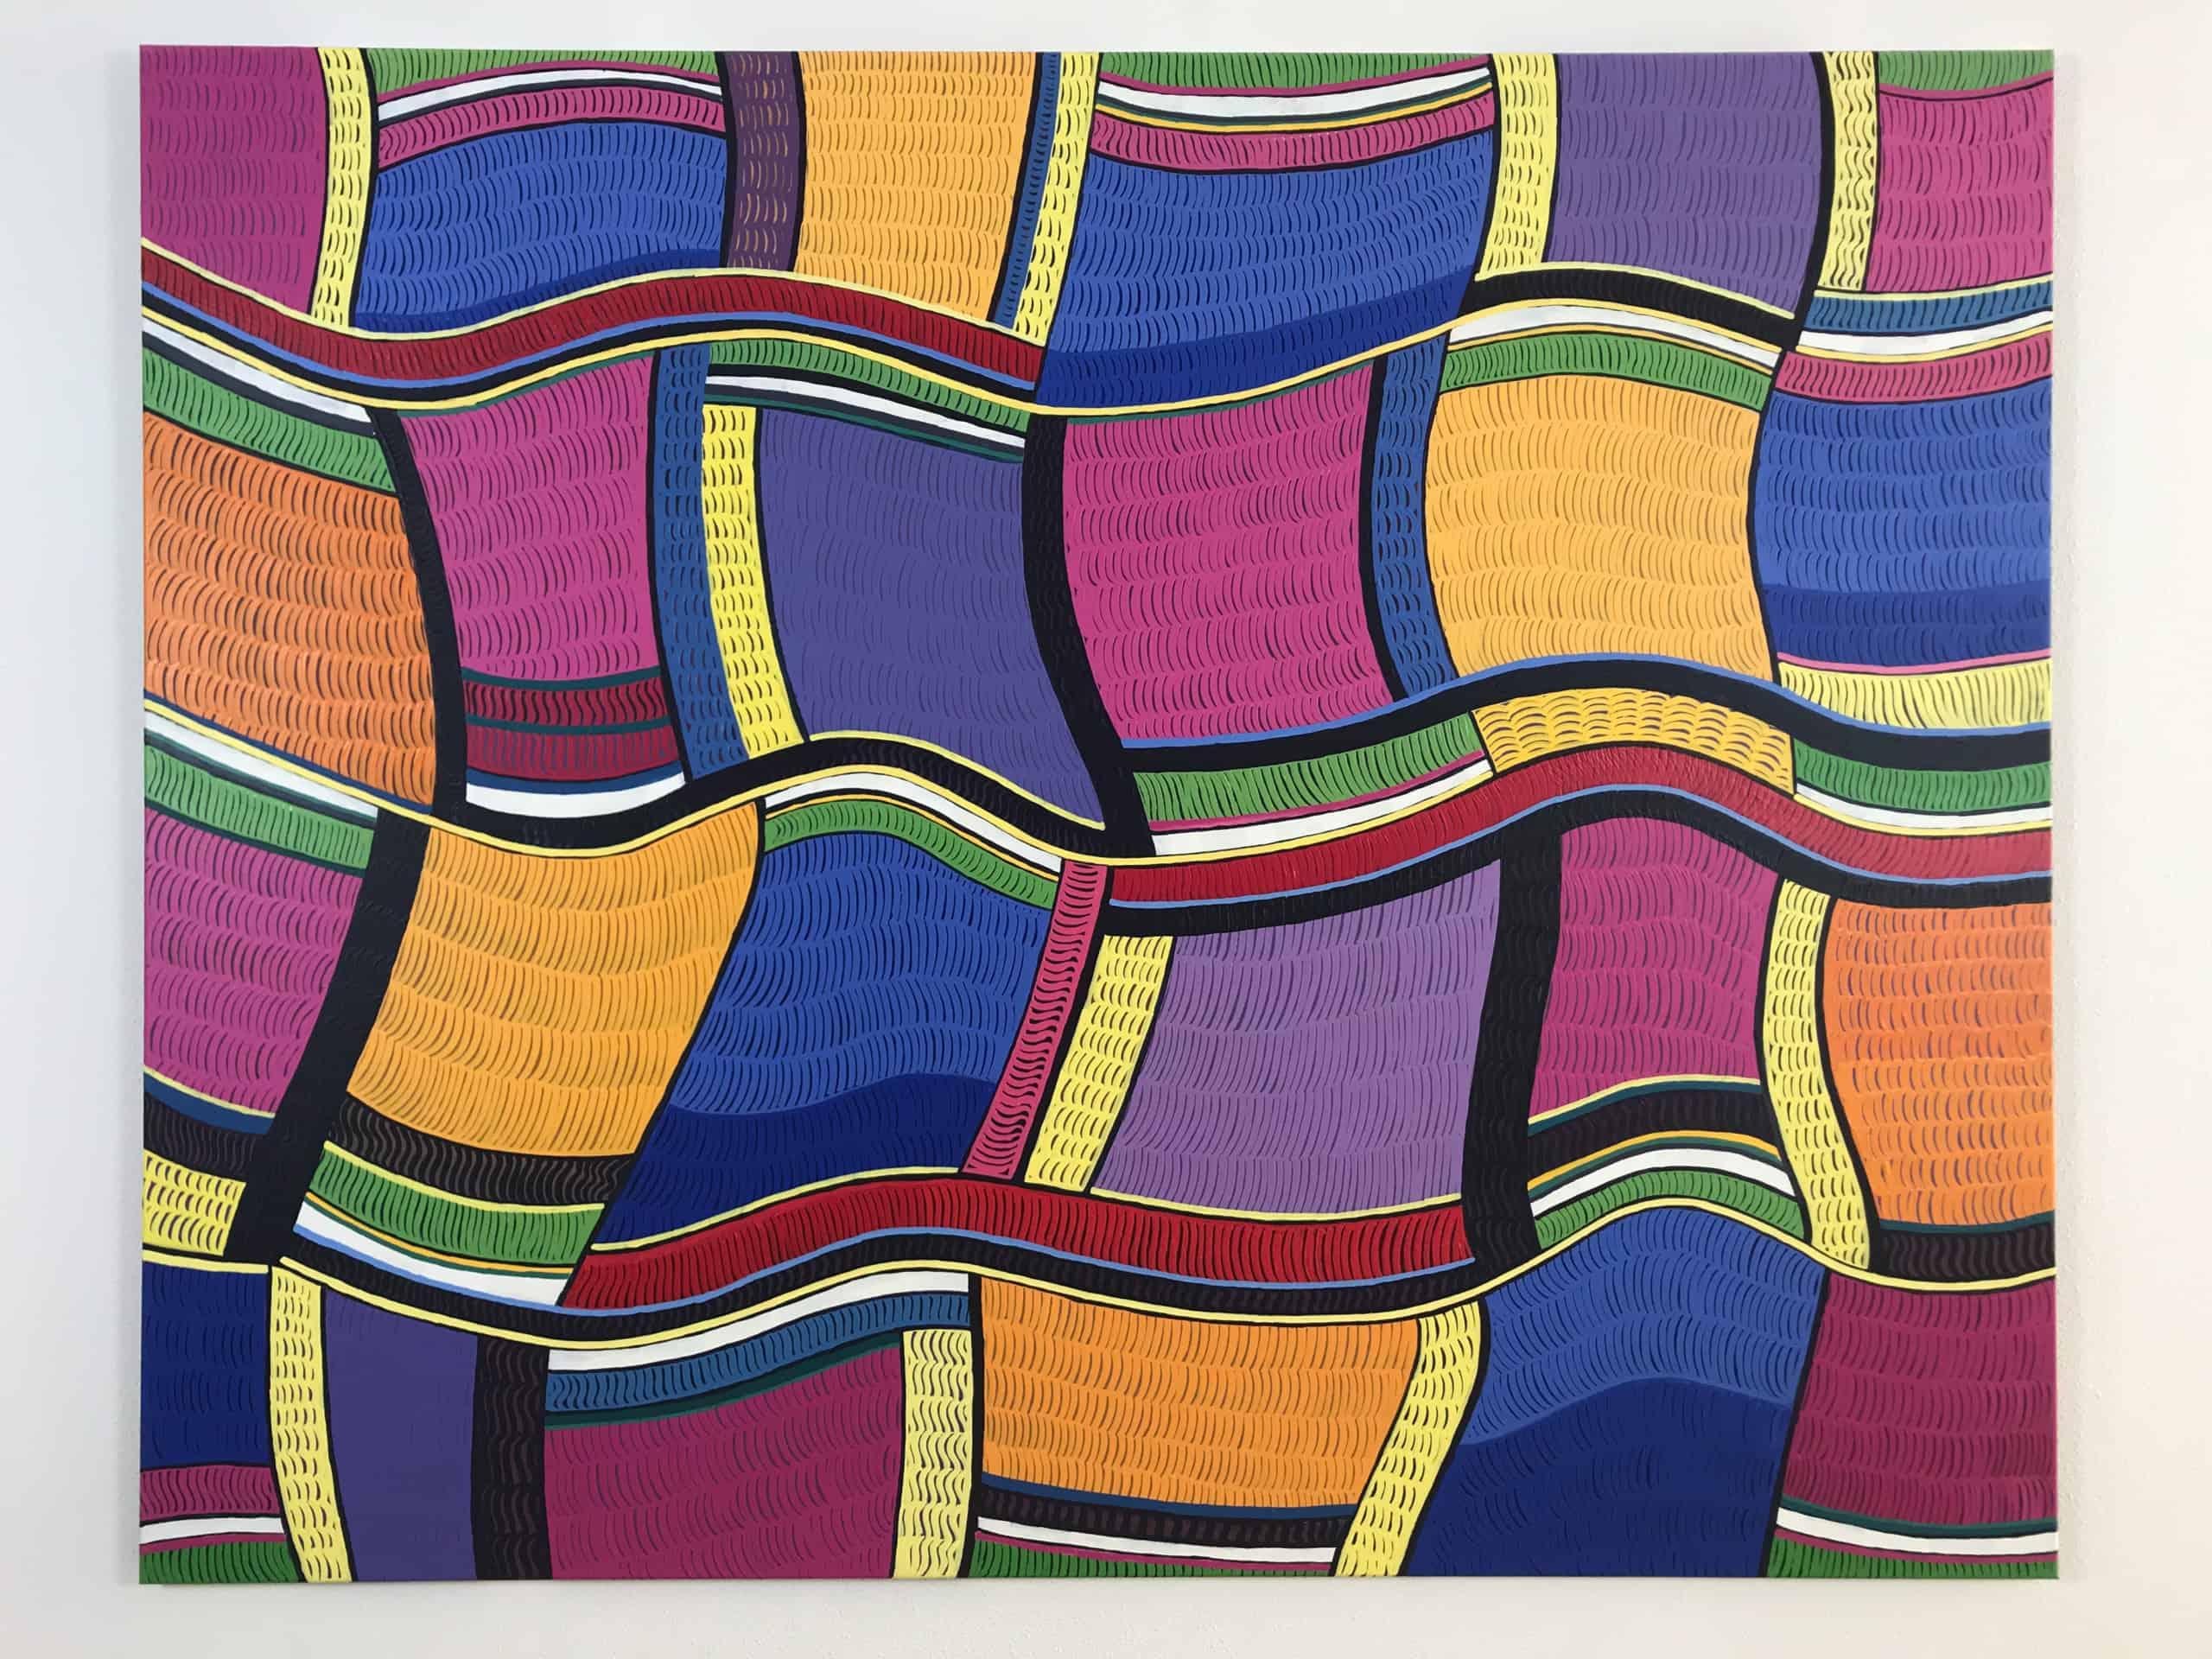 f7-2016-10_(sold)_Tulip-Fields-1_200x160cm_acrylic-on-canvas